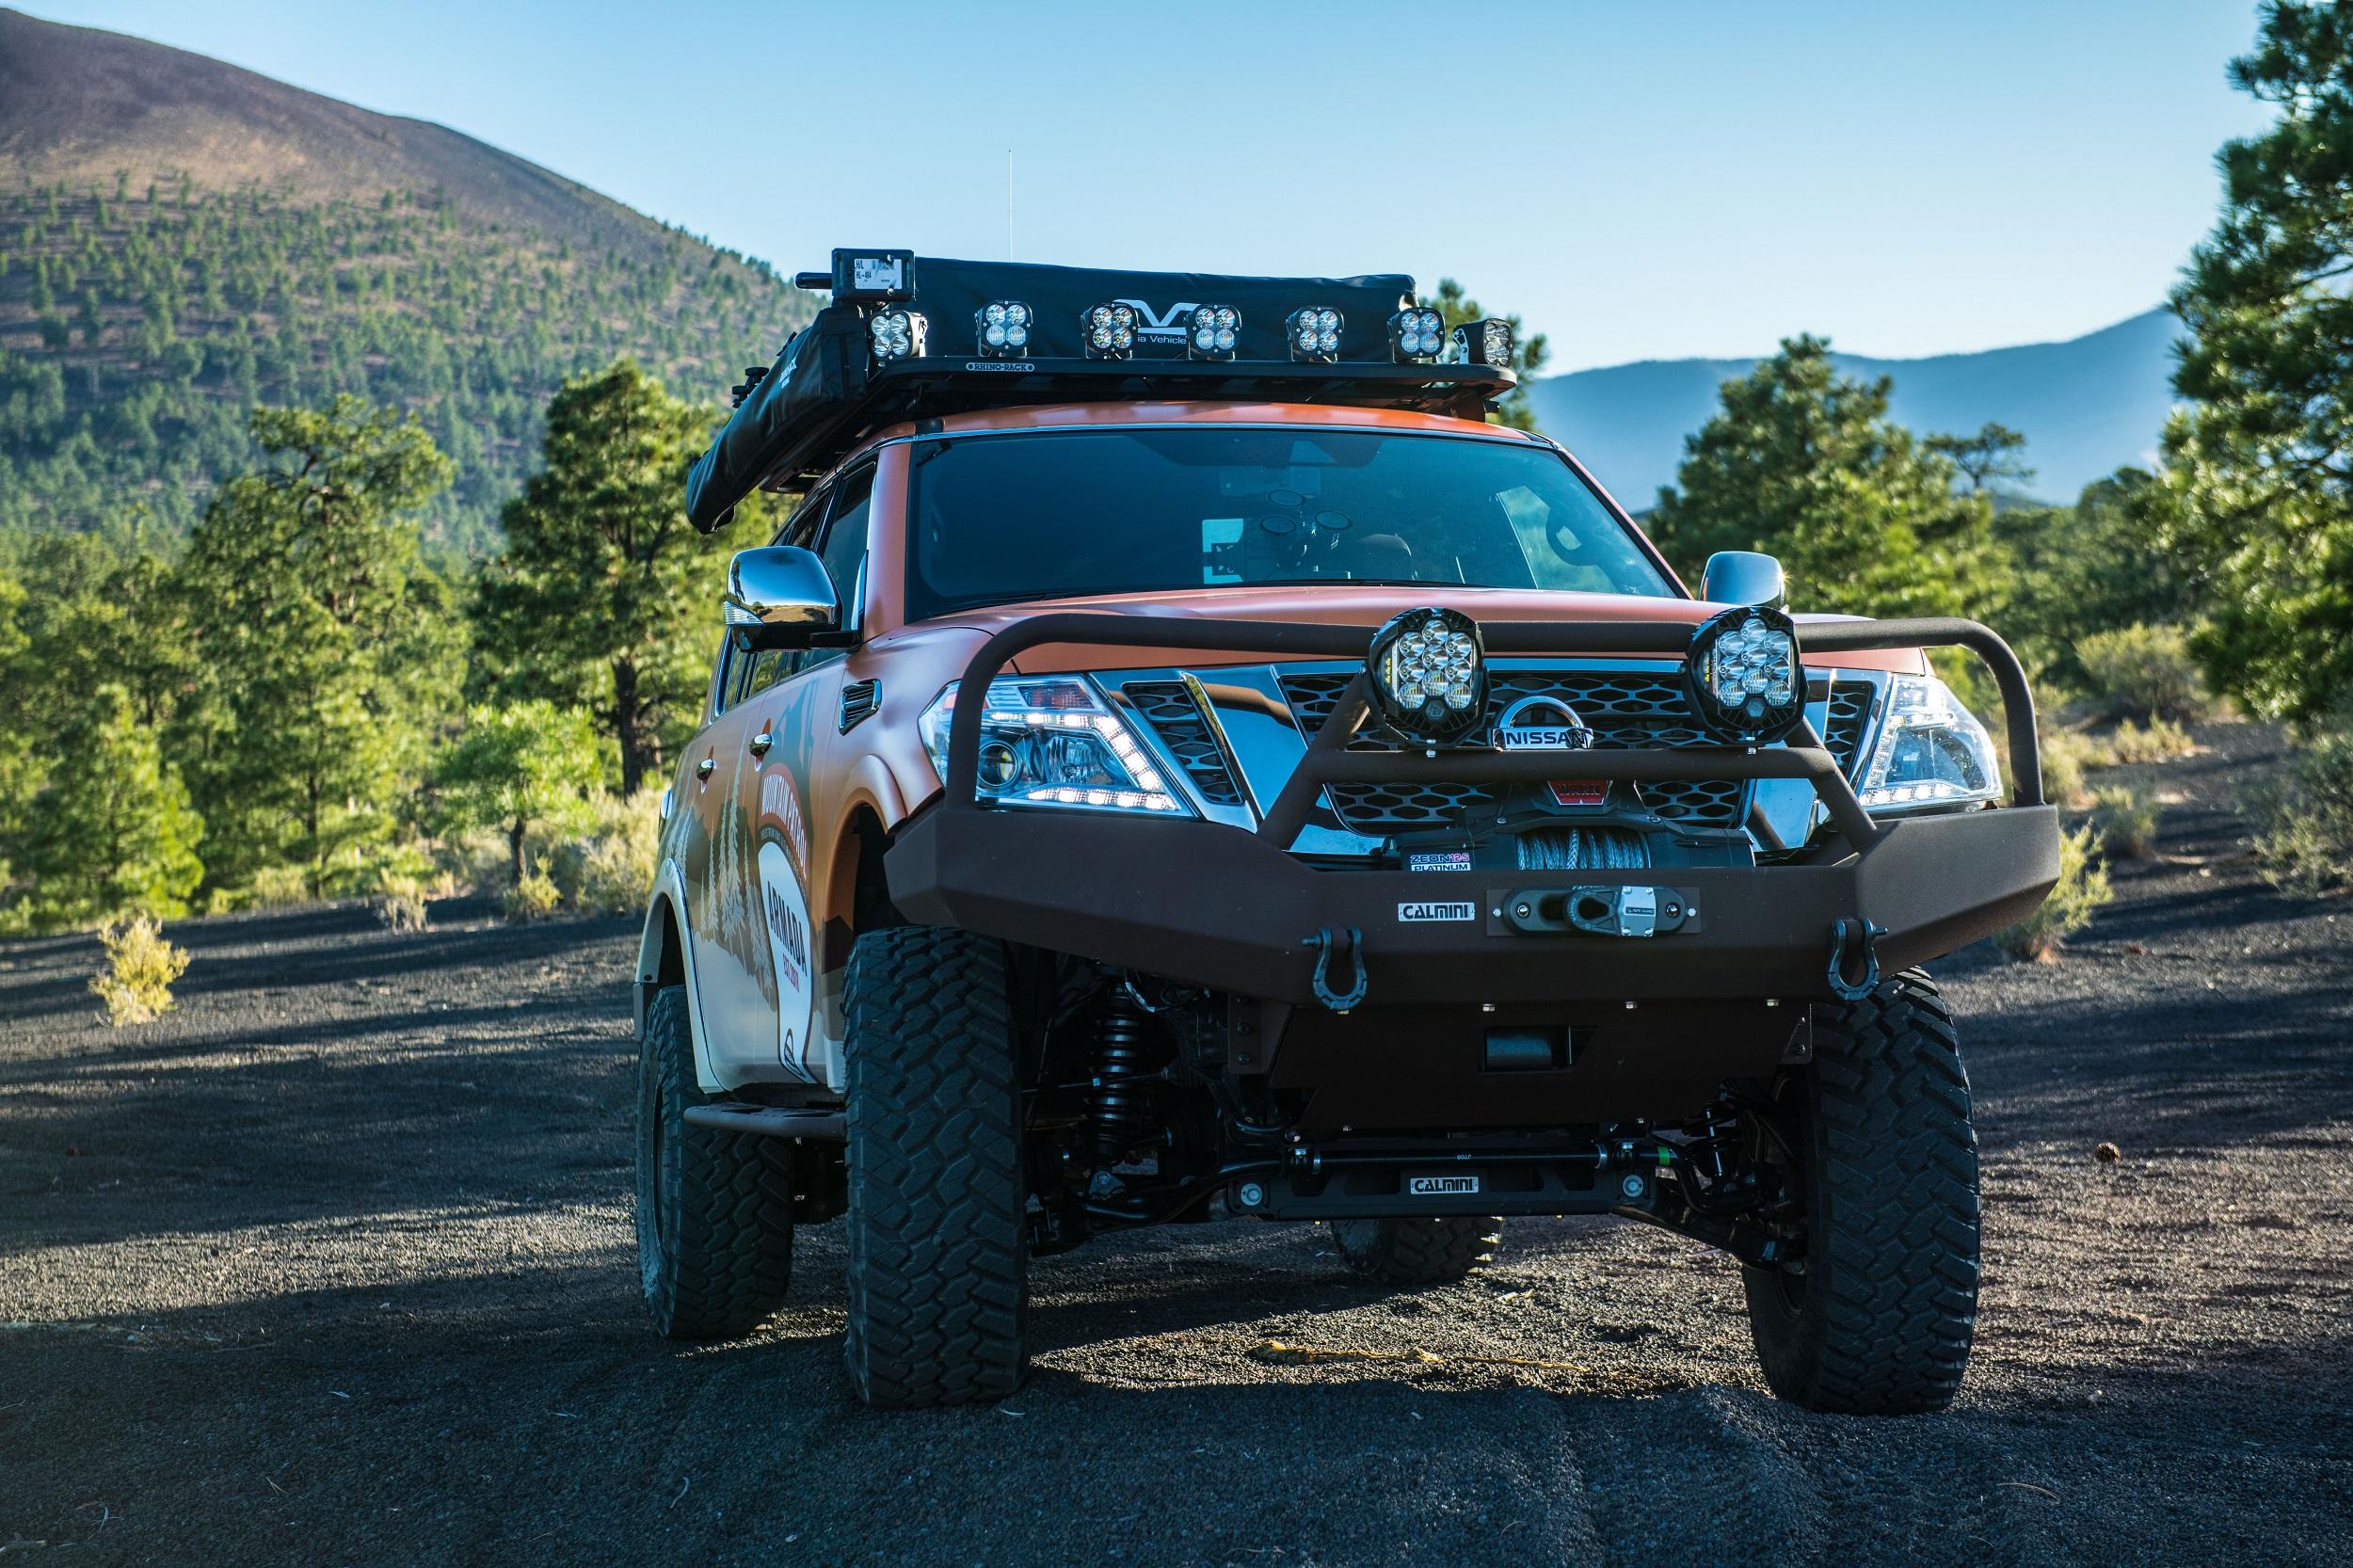 Nissan Armada Mountain Patrol The Future Of Suv Camping